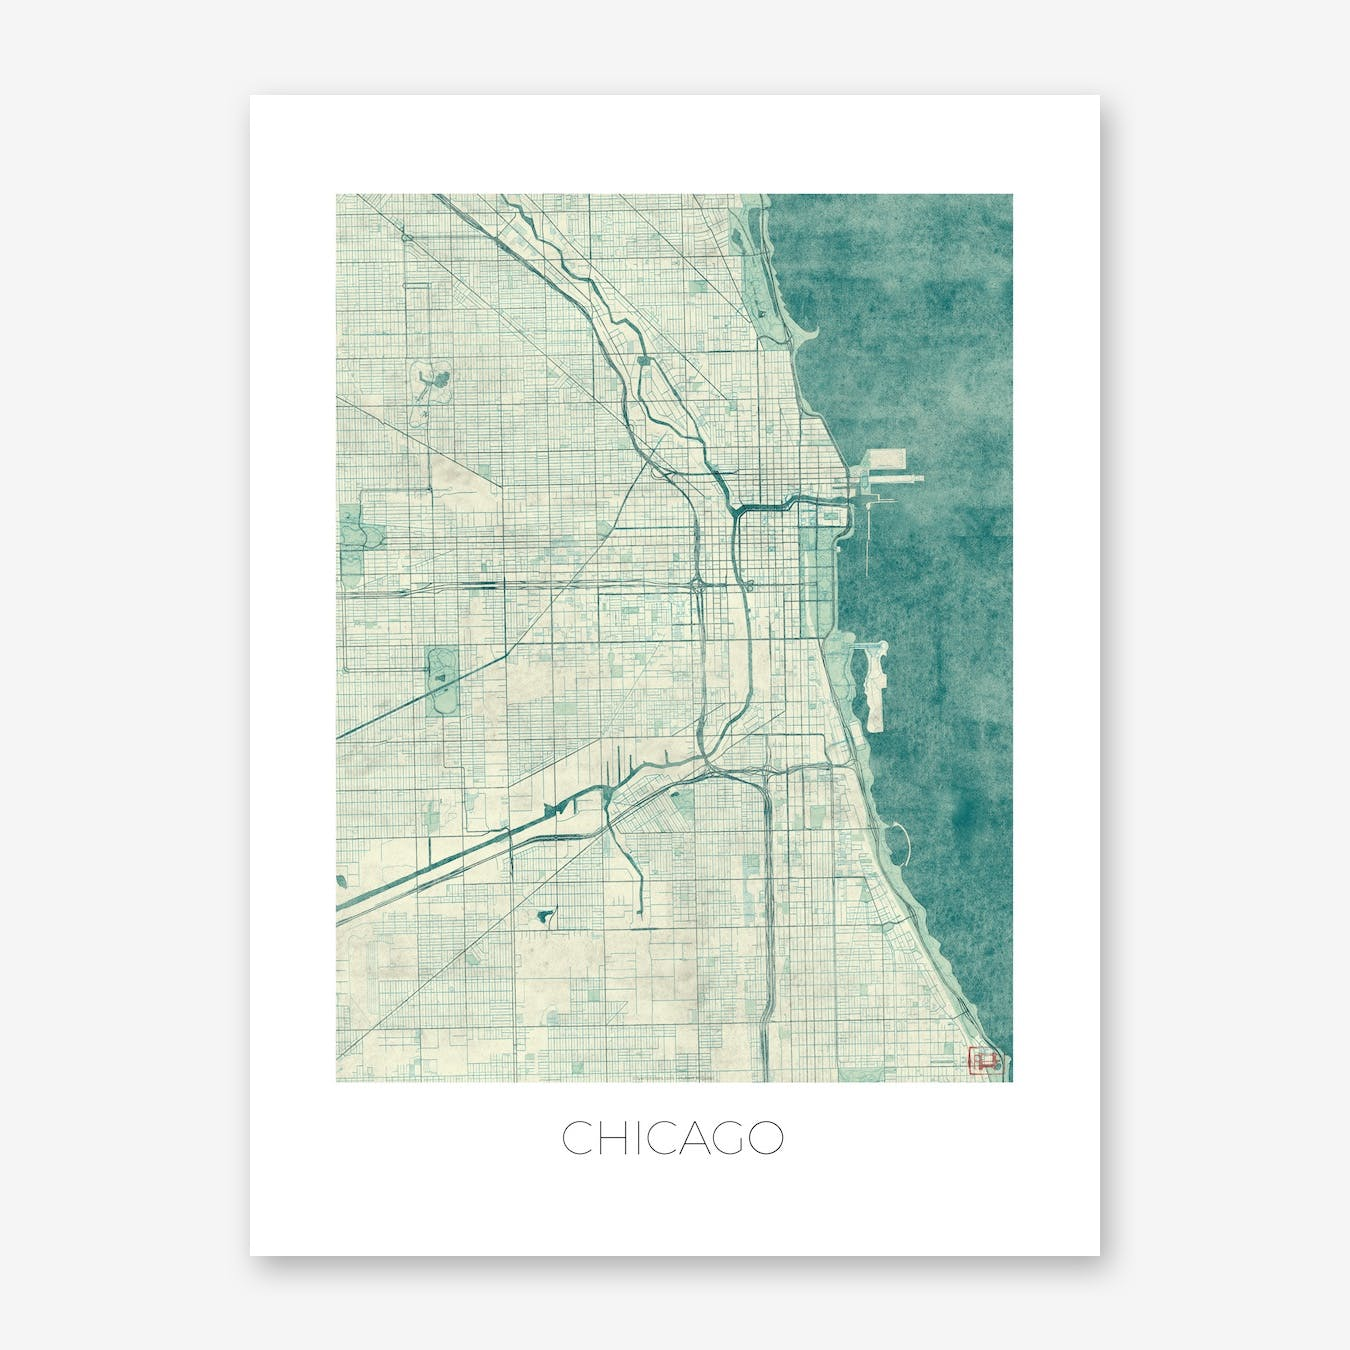 Chicago Map Vintage in Blue